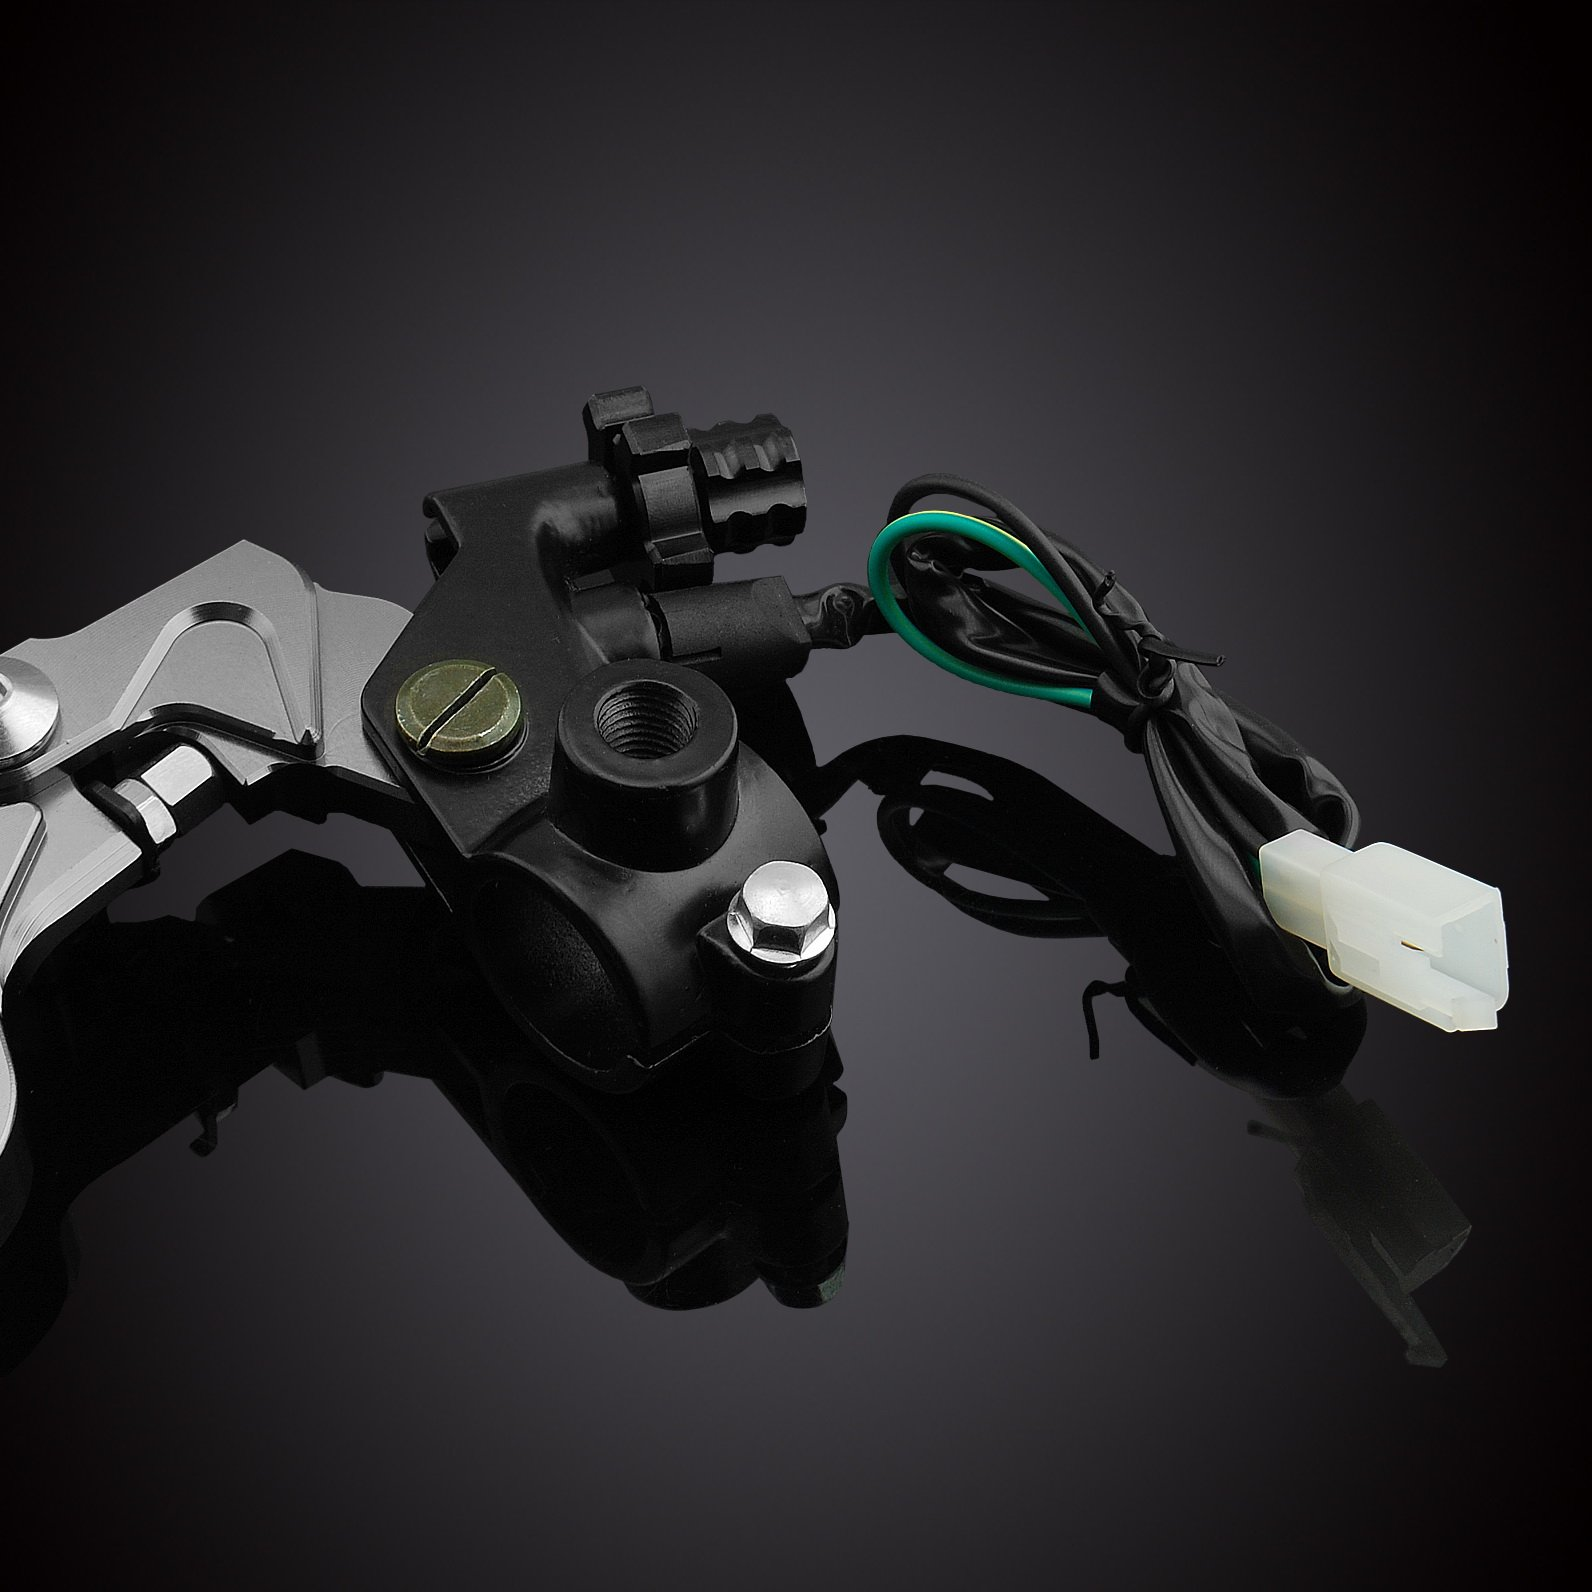 MZS 7/8 Brake Master Cylinder Reservoir Pivot Levers Set for Honda Yamaha Suzuki Kawasaki KTM (Gray) by MZS (Image #6)